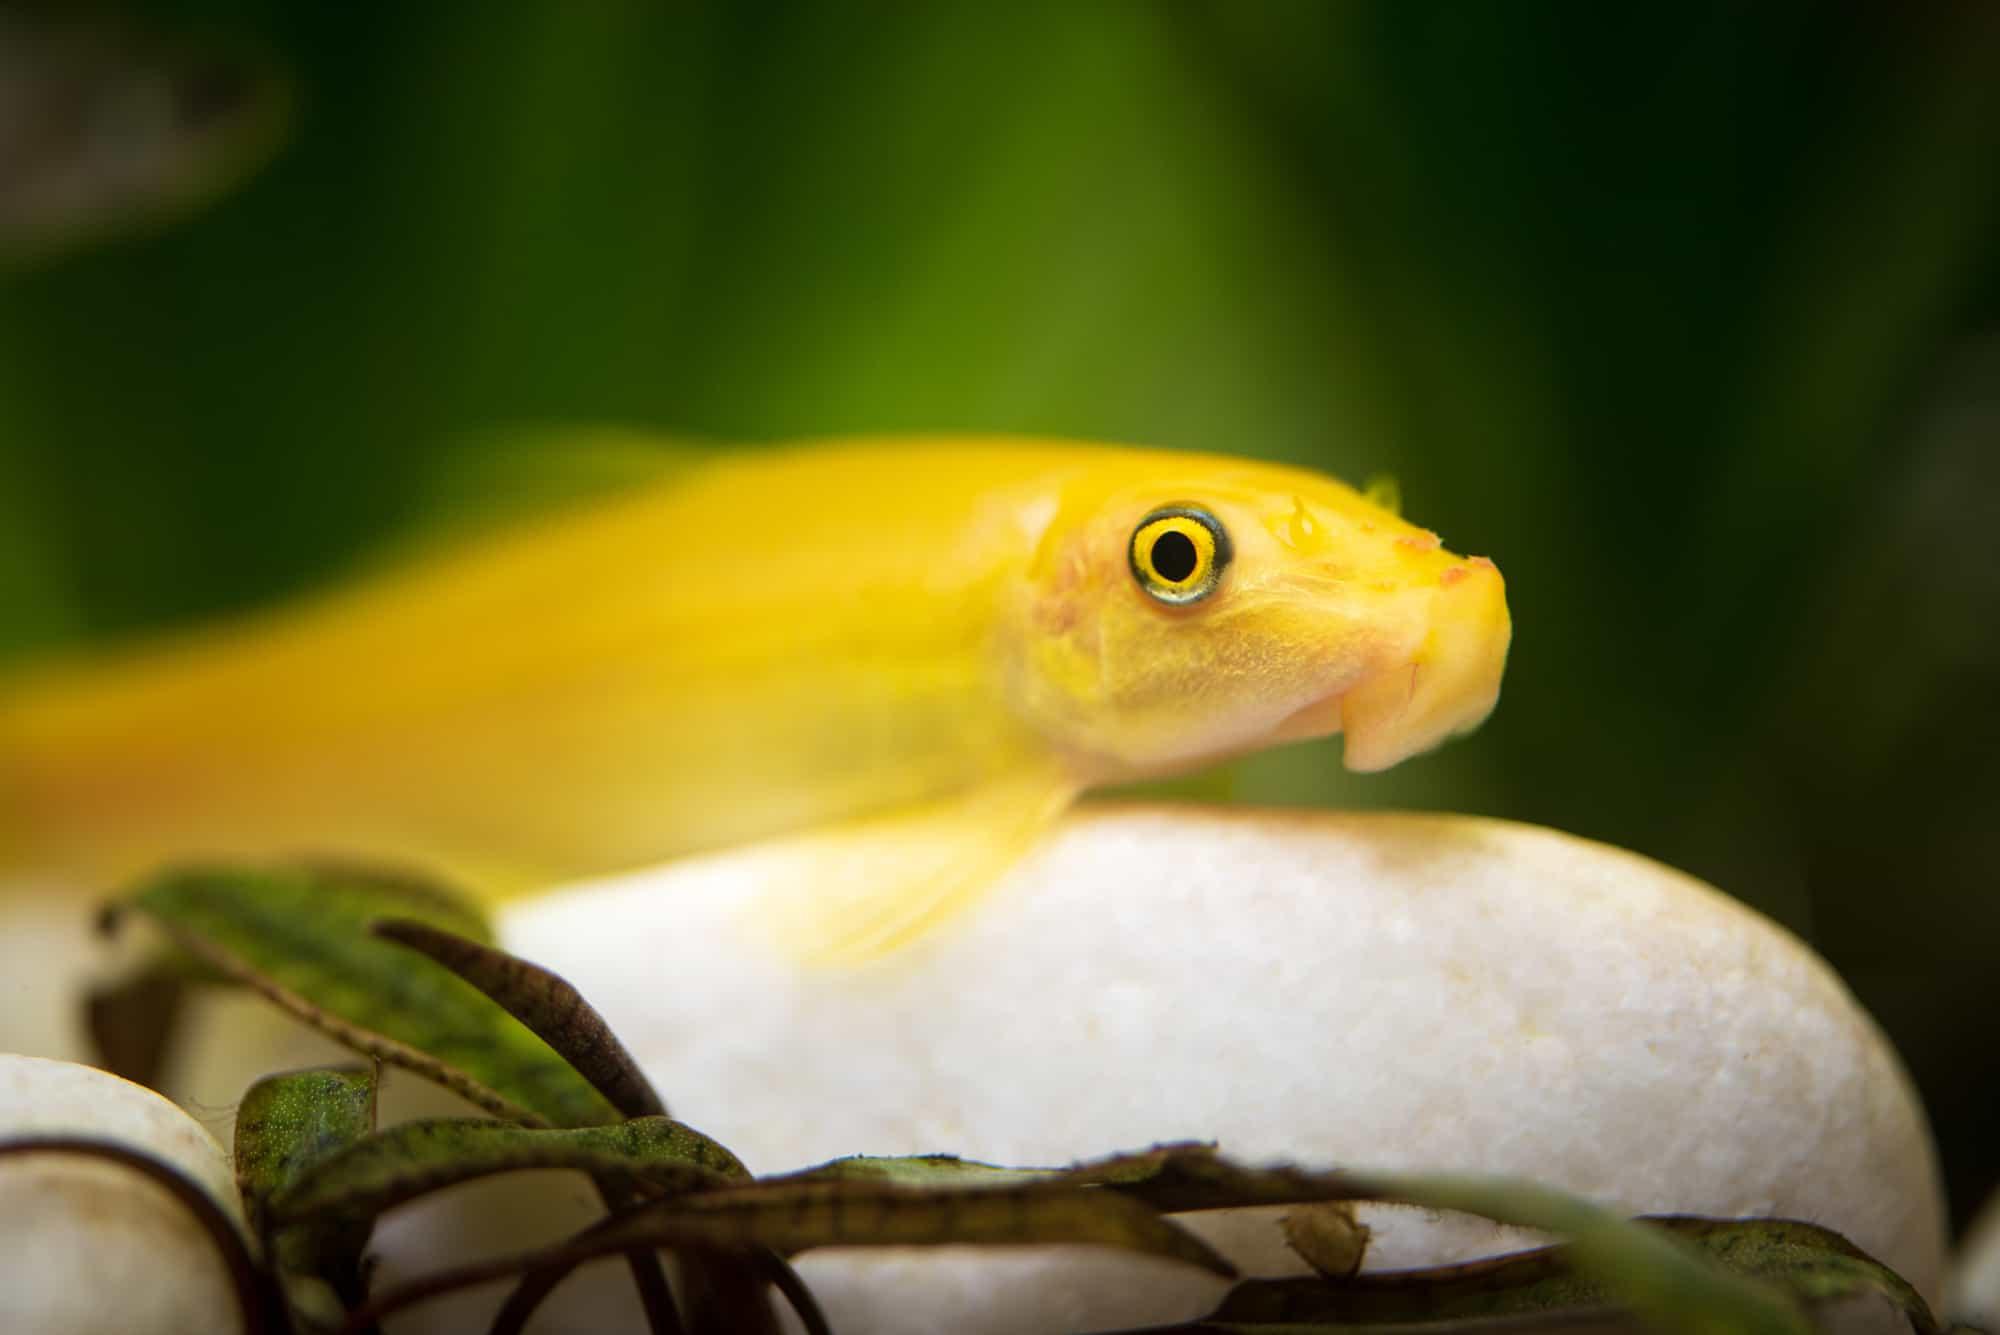 Yellow chinese algaey eater - Gyrinocheilus in fishtank cleaning stone. Aquaria concept